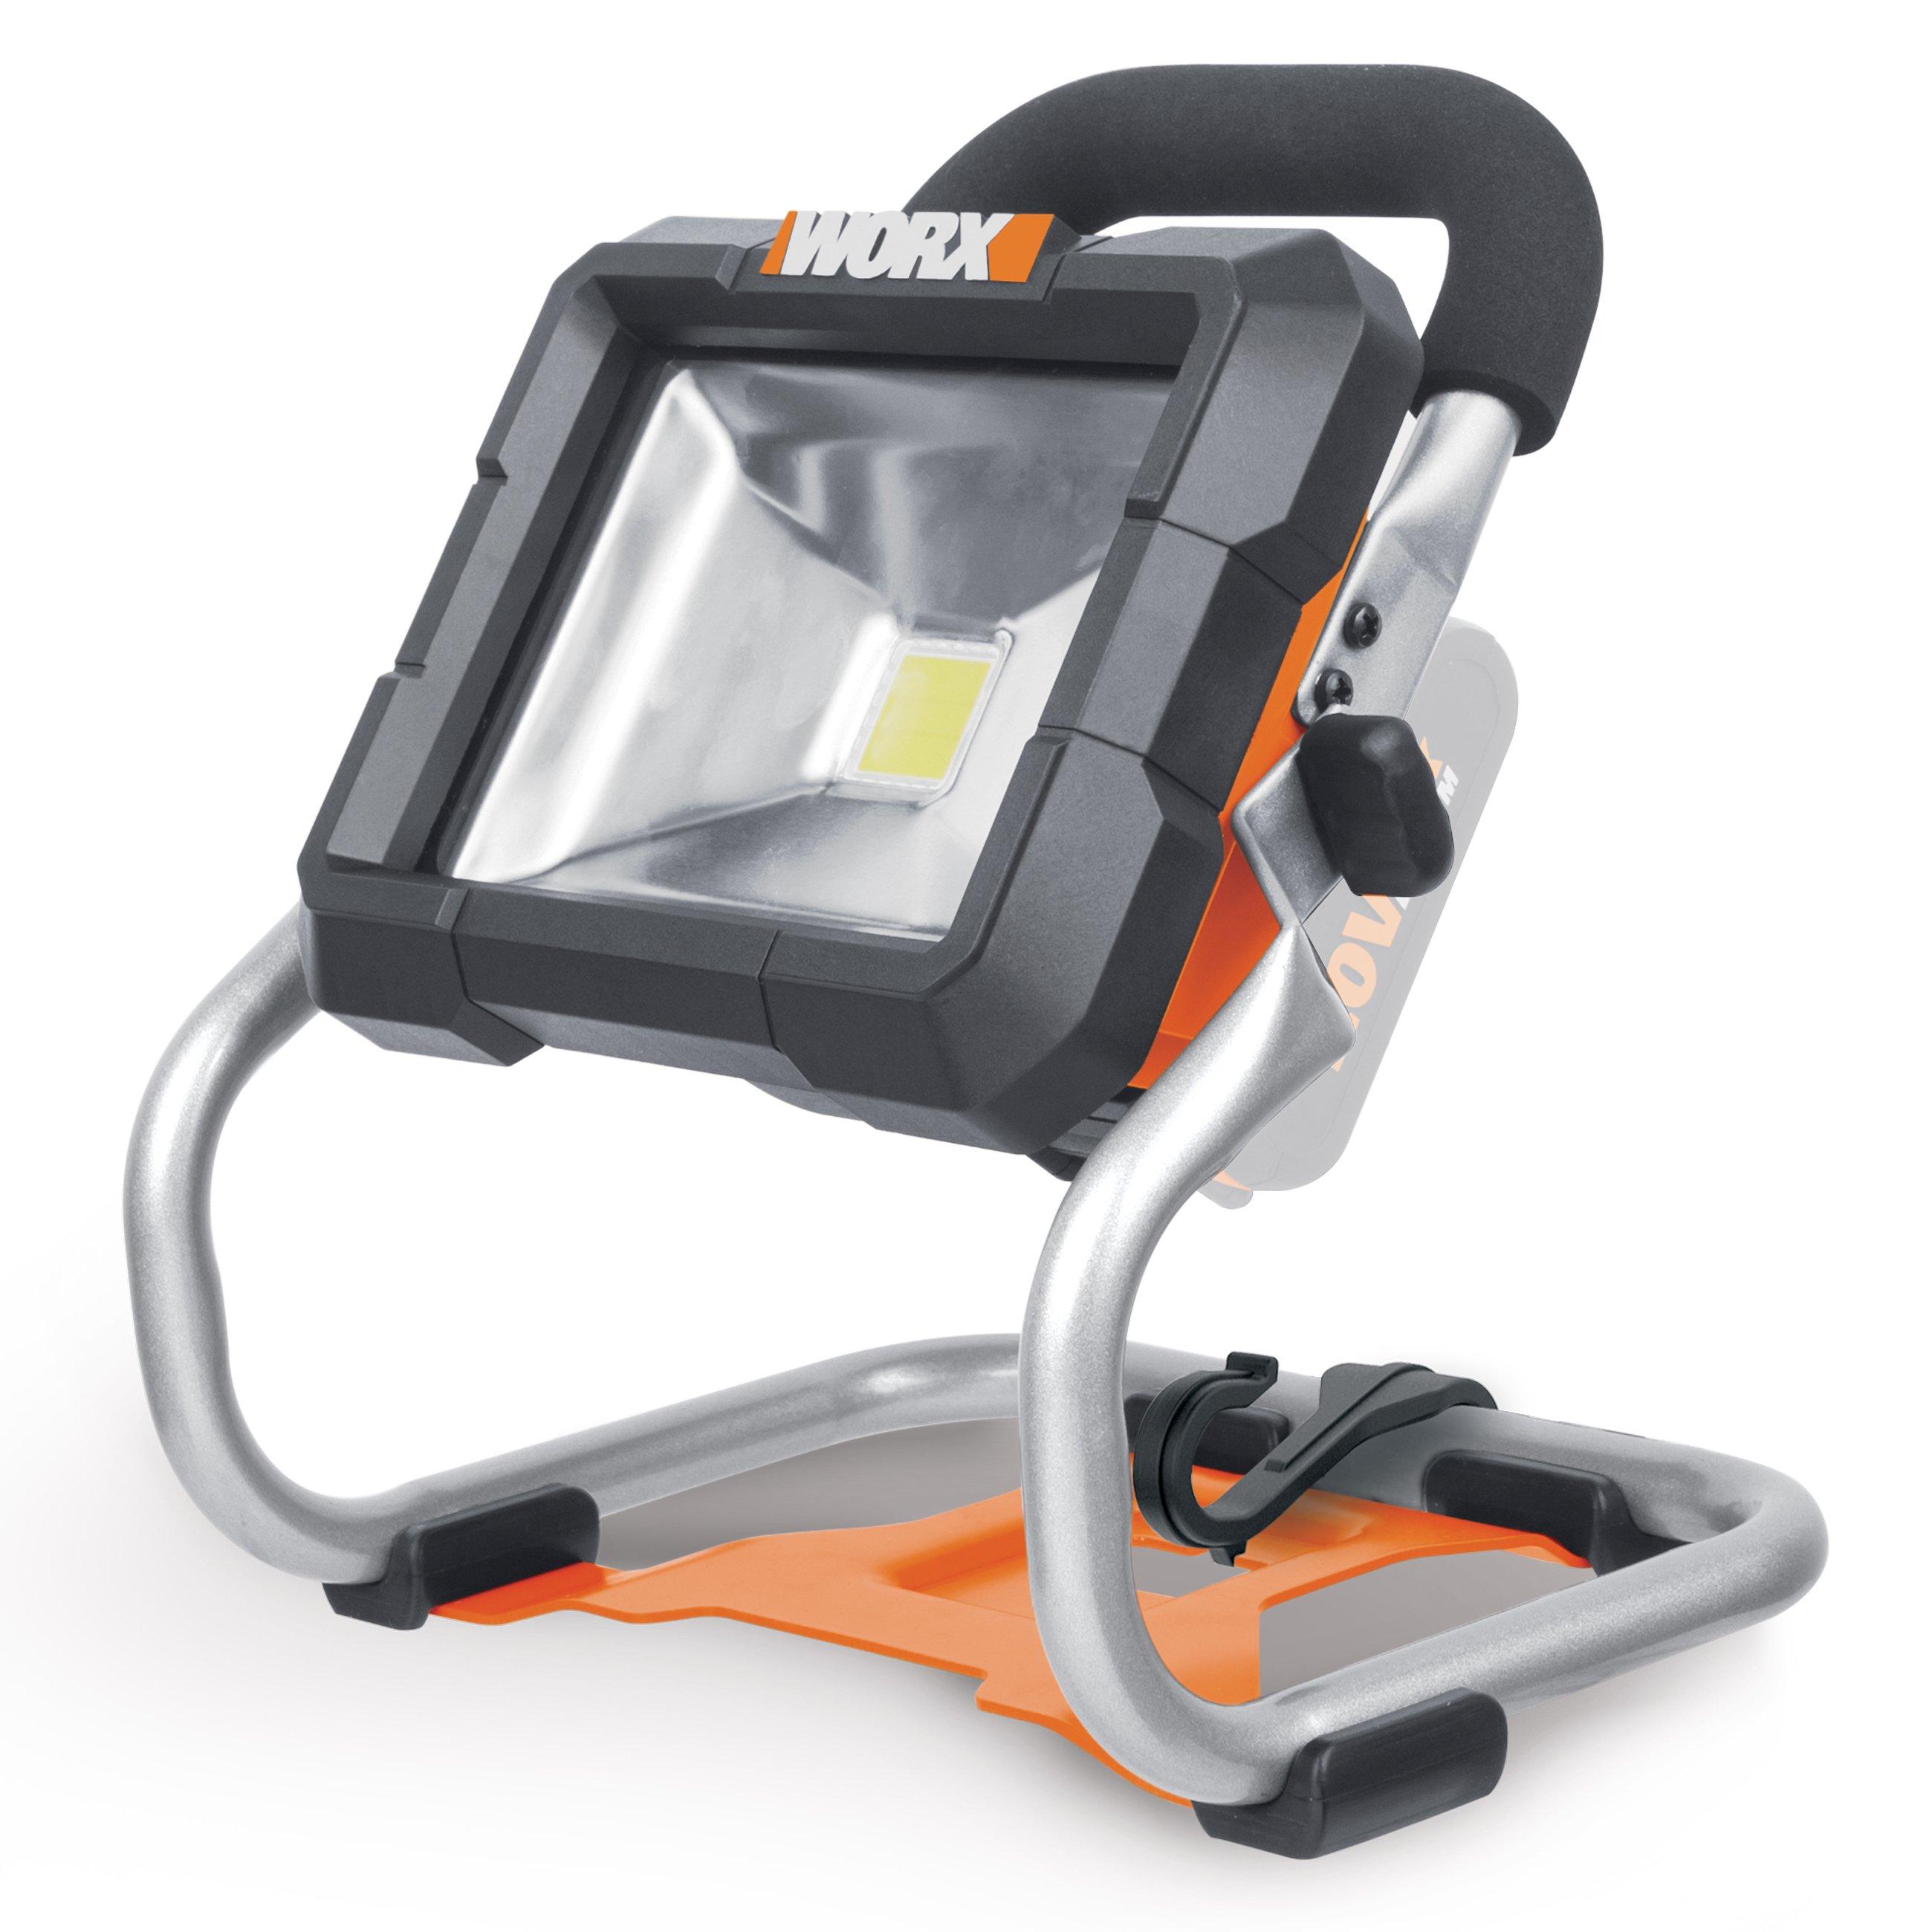 worx-wx026.9 φως που λειτουργεί με μπαταρία